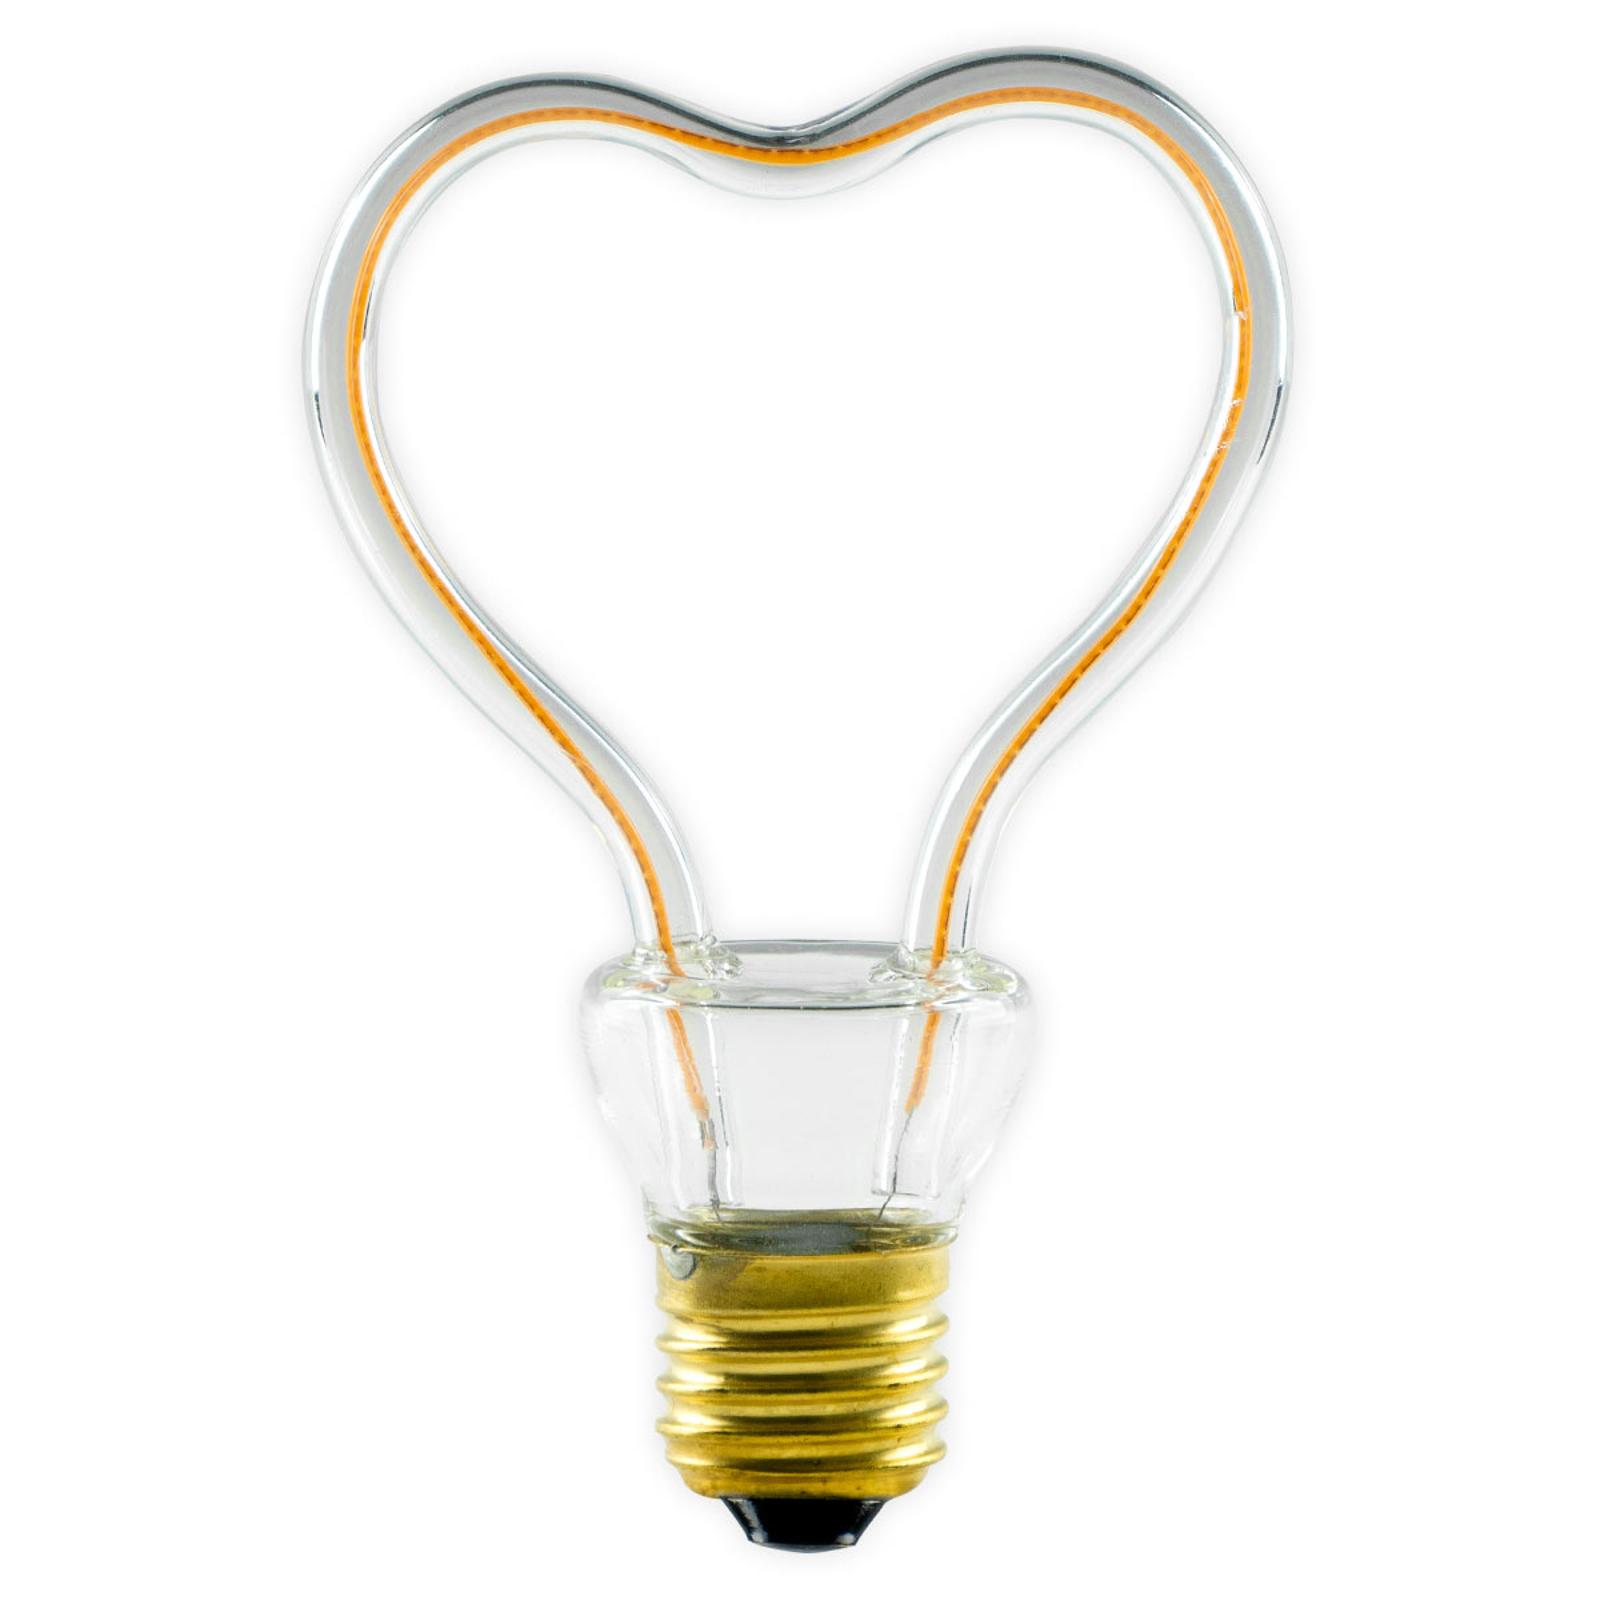 LED-Lampe Art Line Heart E27 8W 330 lm warmweiß